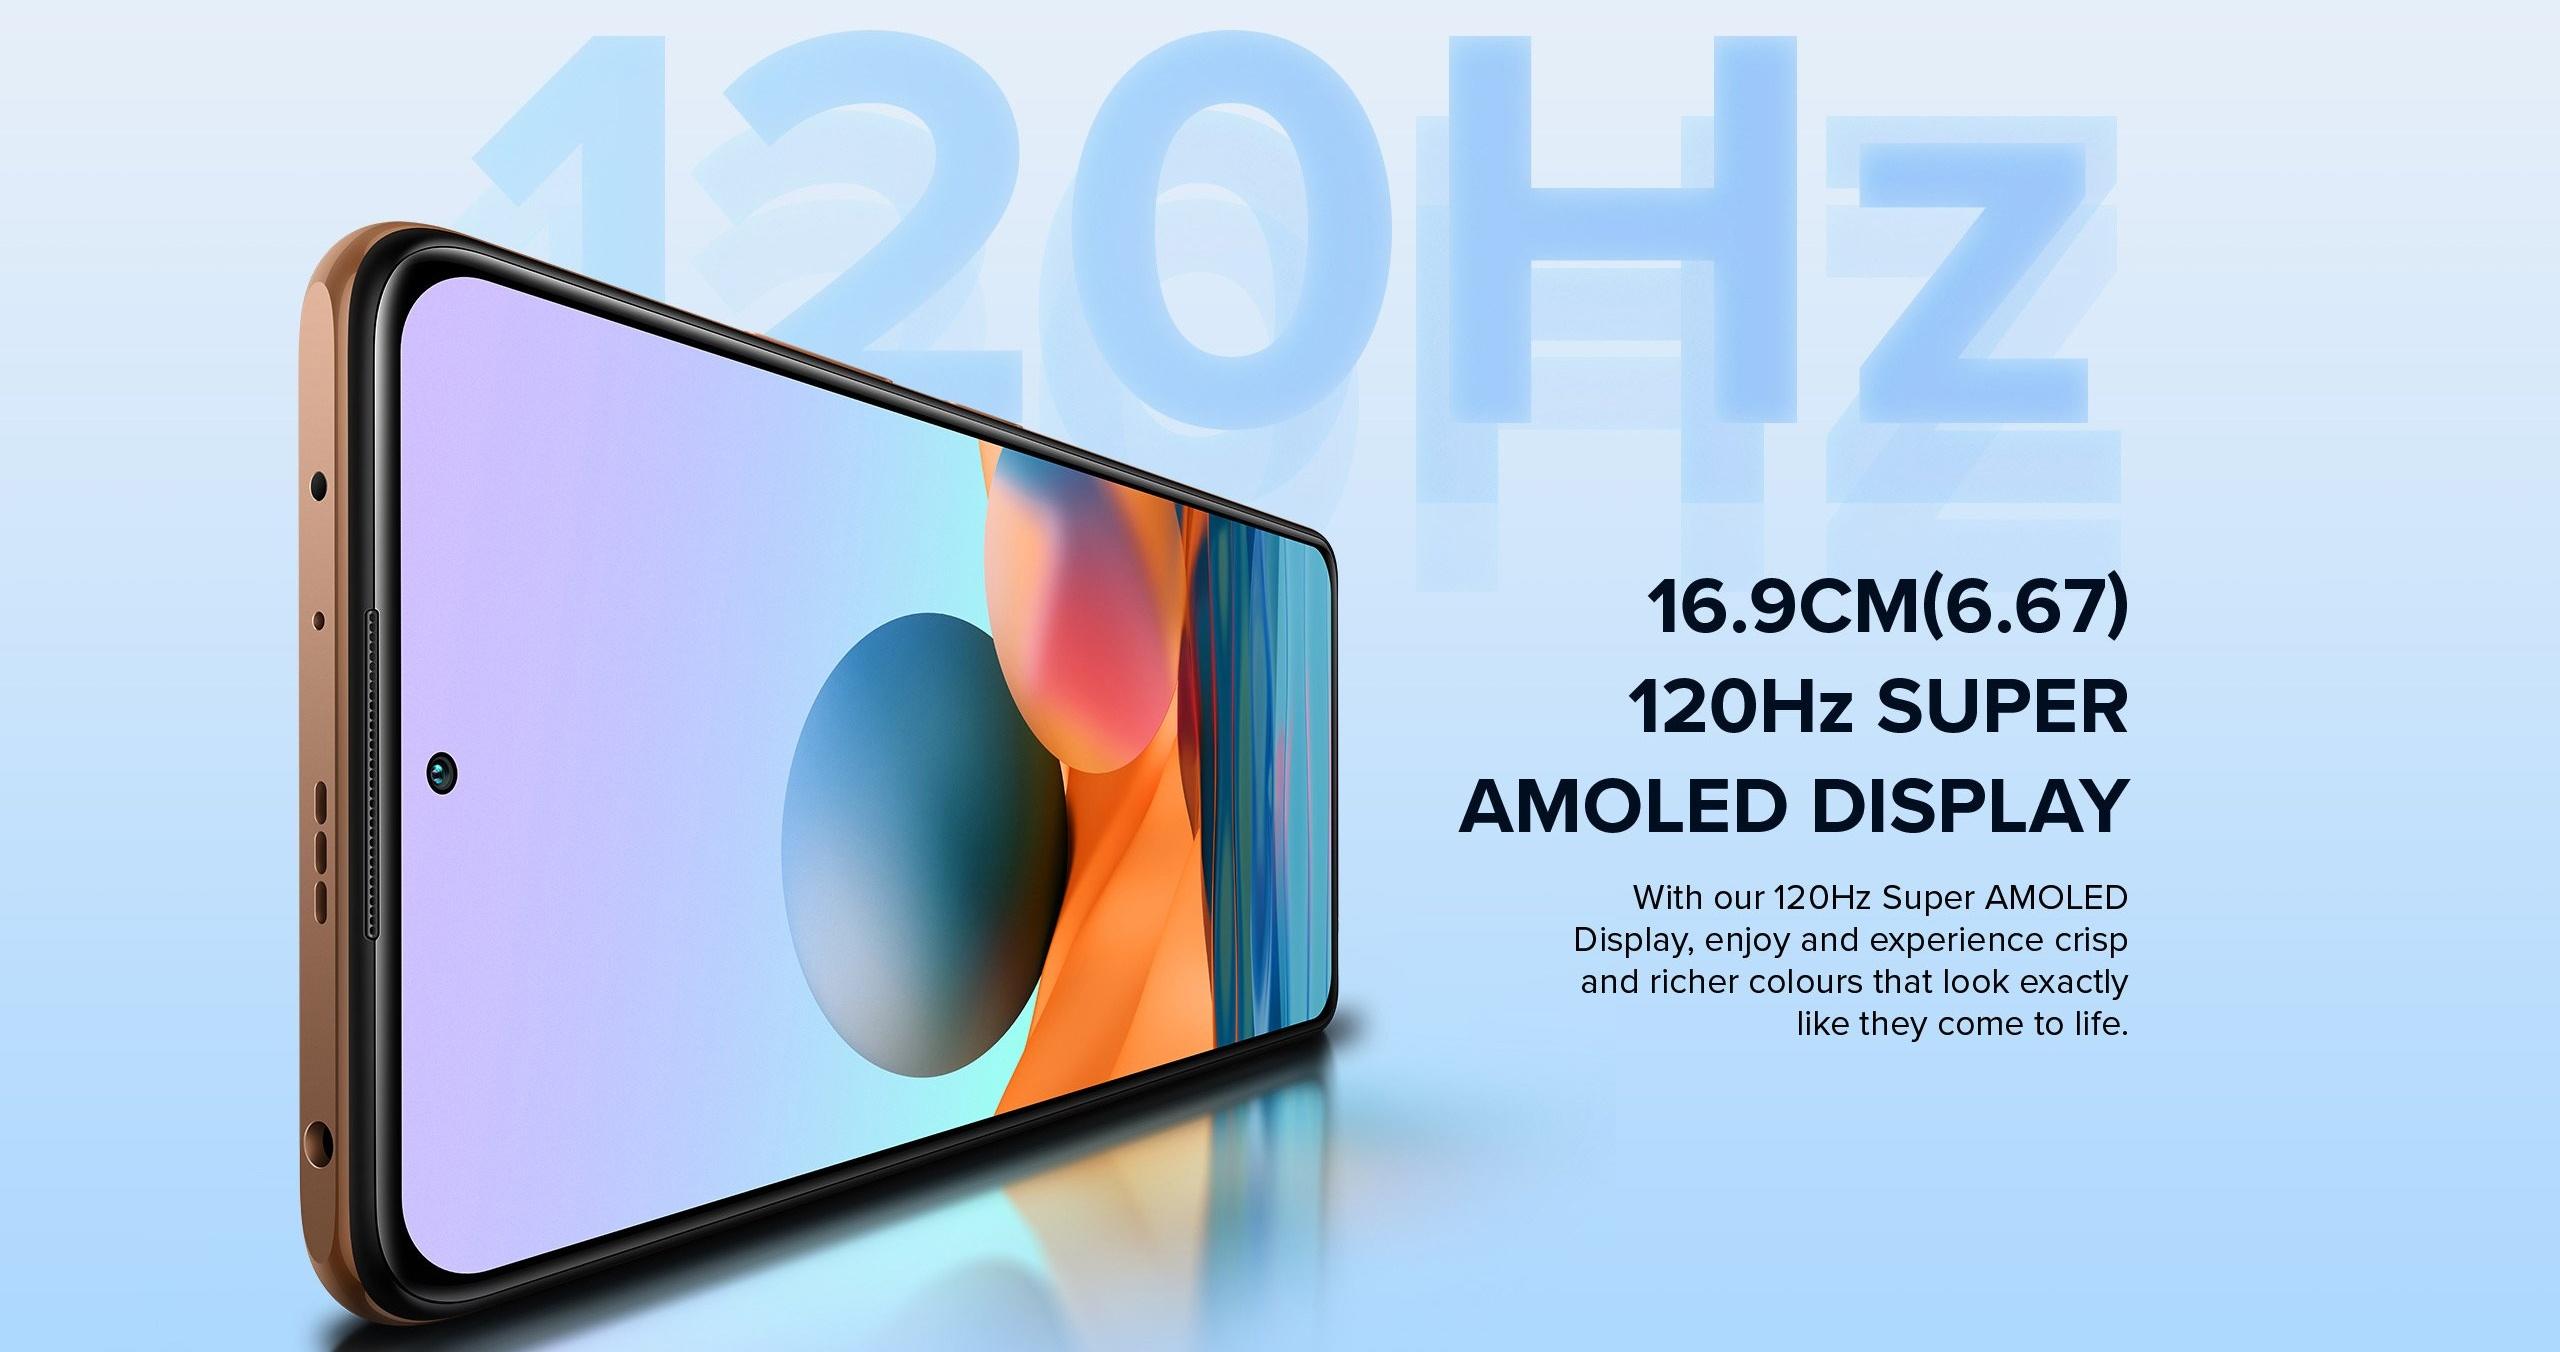 Redmi Note 10 Pro - 120HZ Super AMOLED